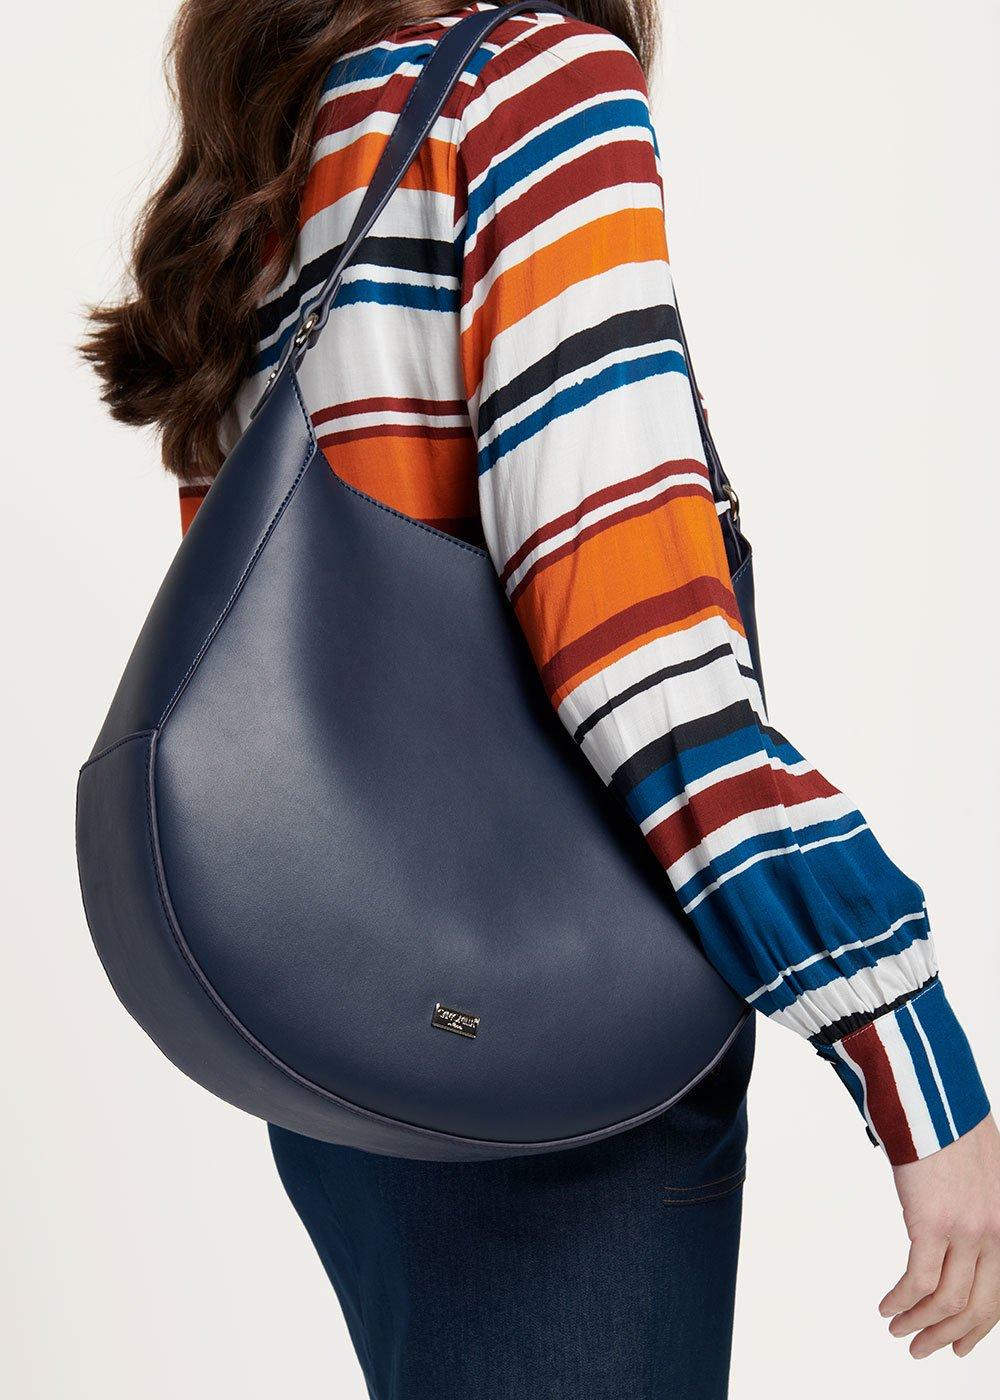 Bilia hobo bag - Medium Blue - Woman